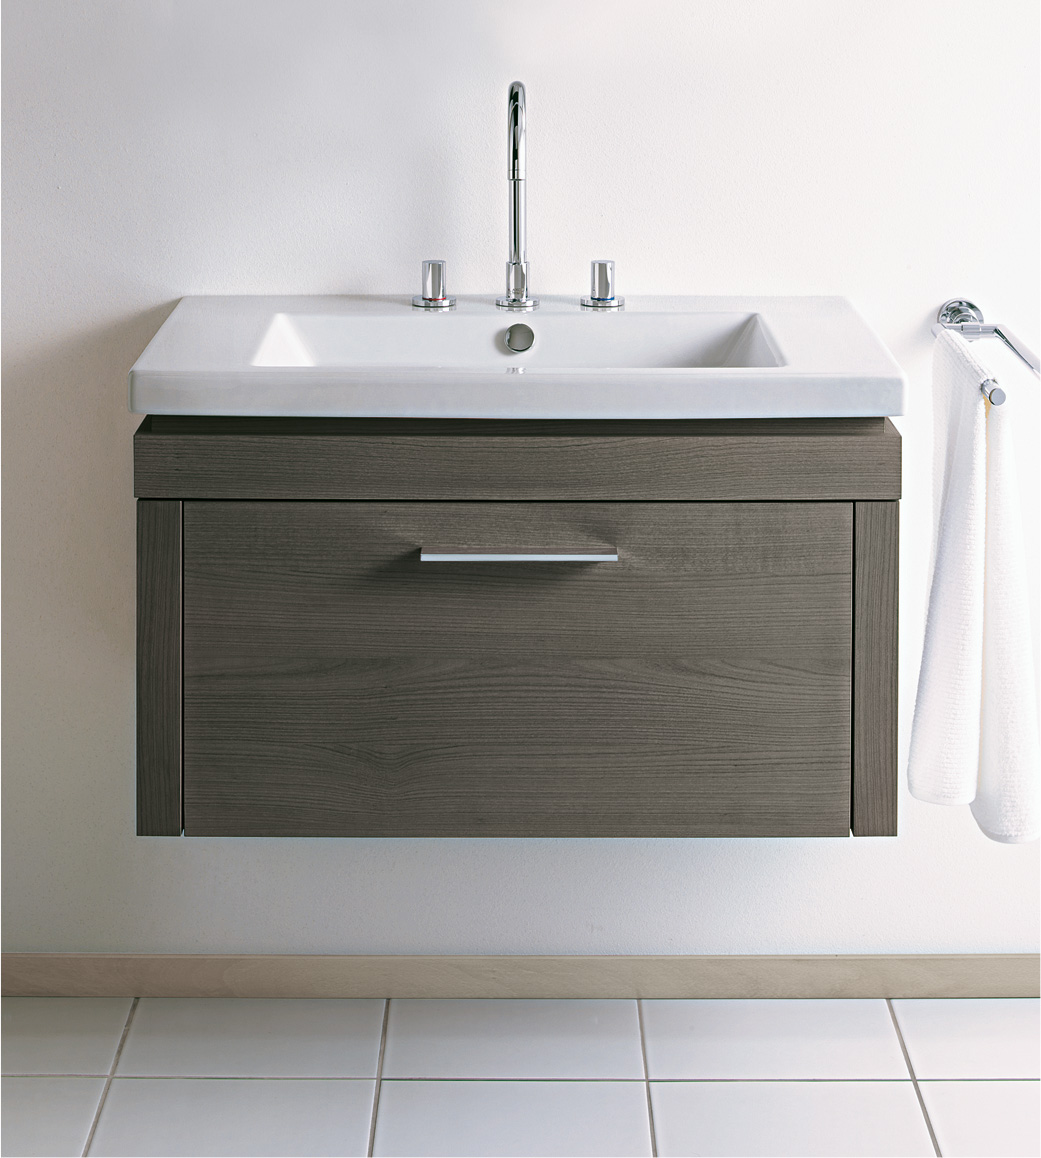 Nice Modern Bathroom Sink Cabinets. 2nd Floor Modern Bathroom Sink Cabinets S